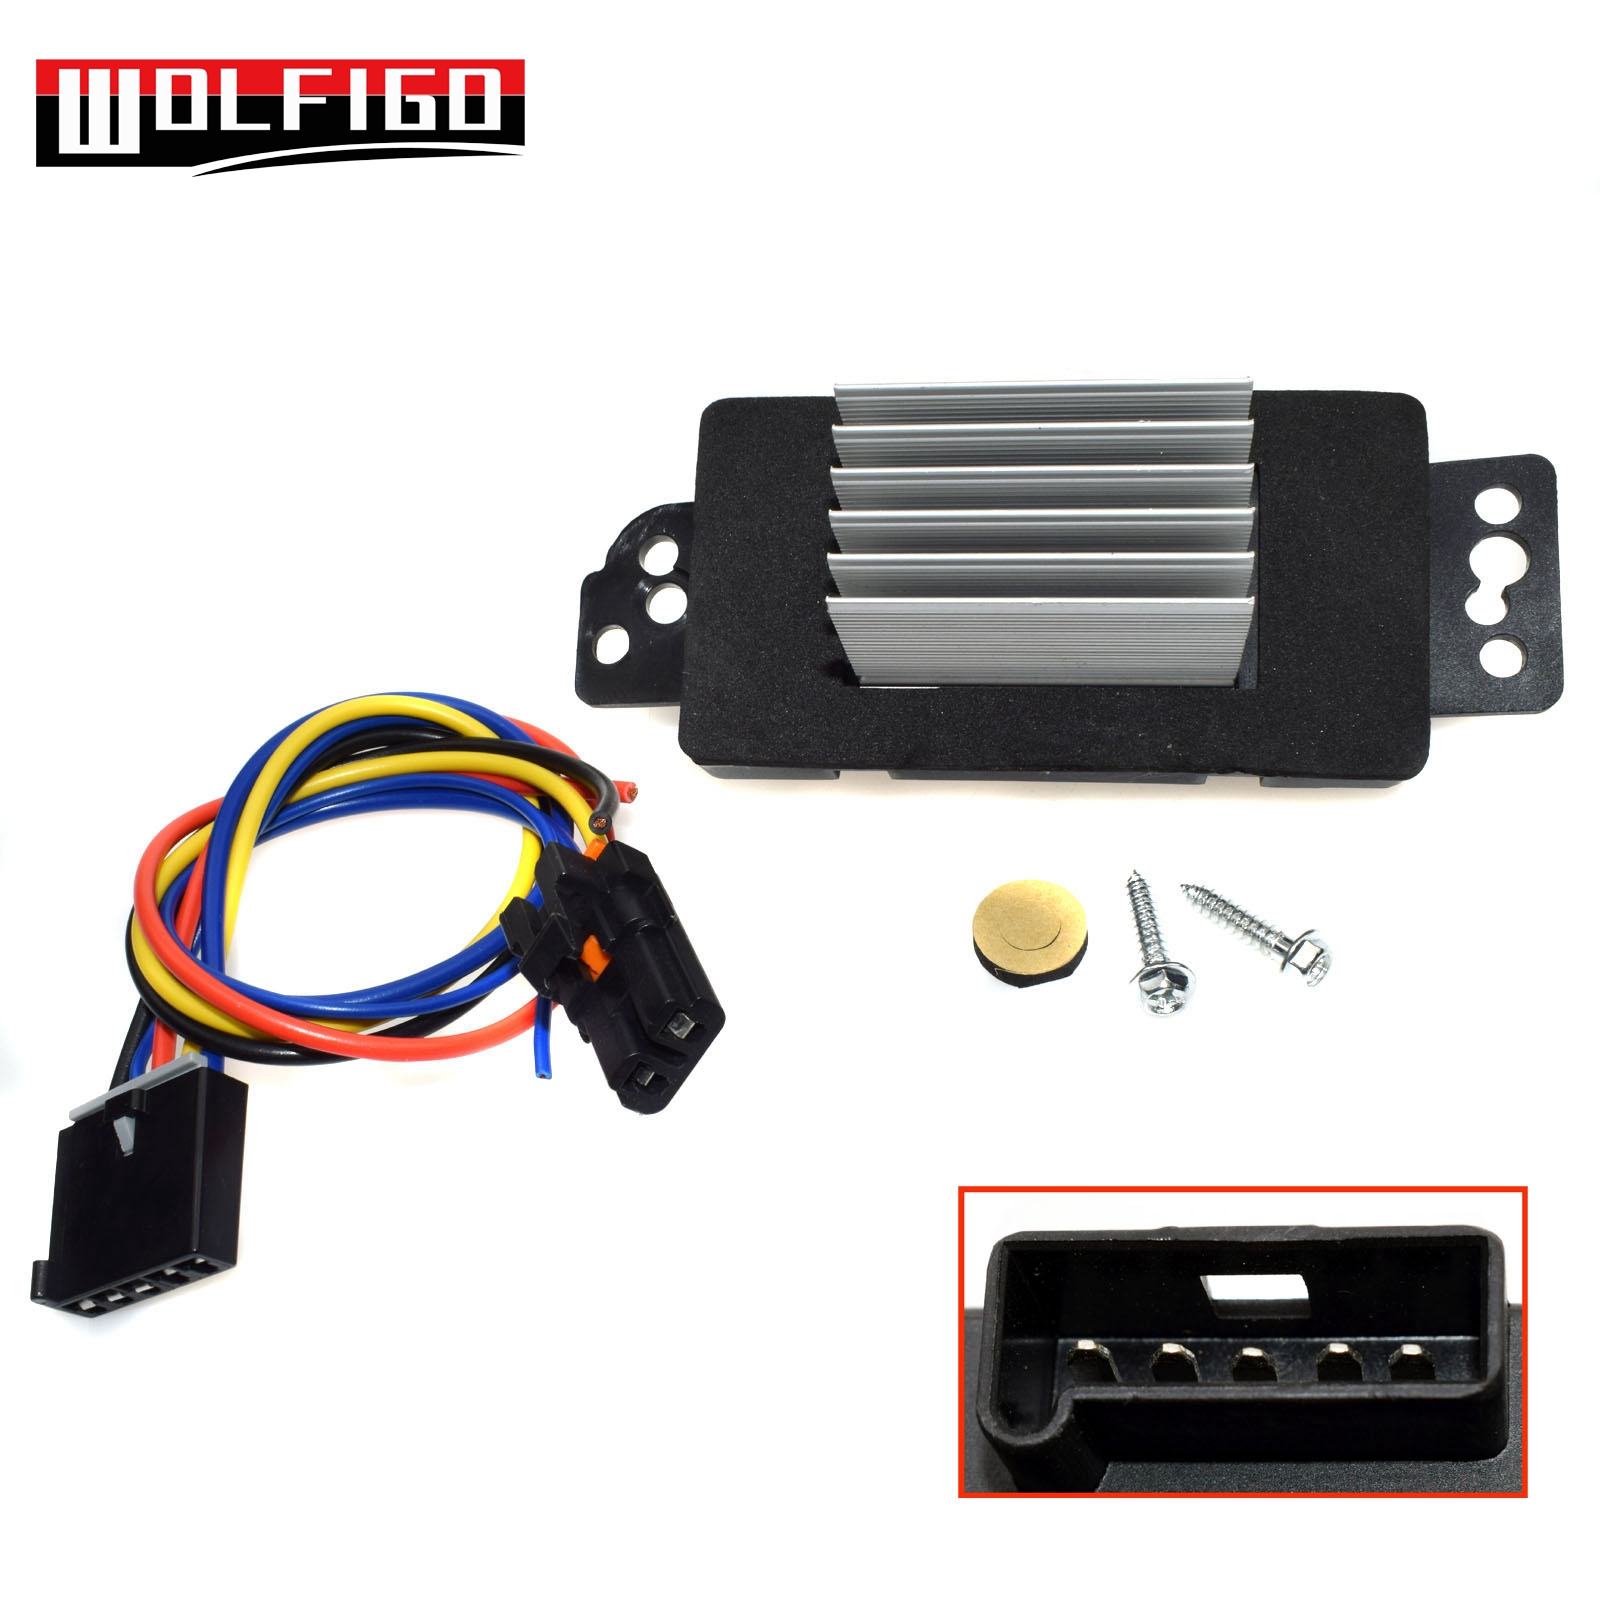 Us 19 23 26 Off Wolfigo Hvac Blower Motor Resistor W Plug Harness For 05 09 Buick Lacrosse Chevrolet Impala 10325408 10356906 10397570 1580888 In